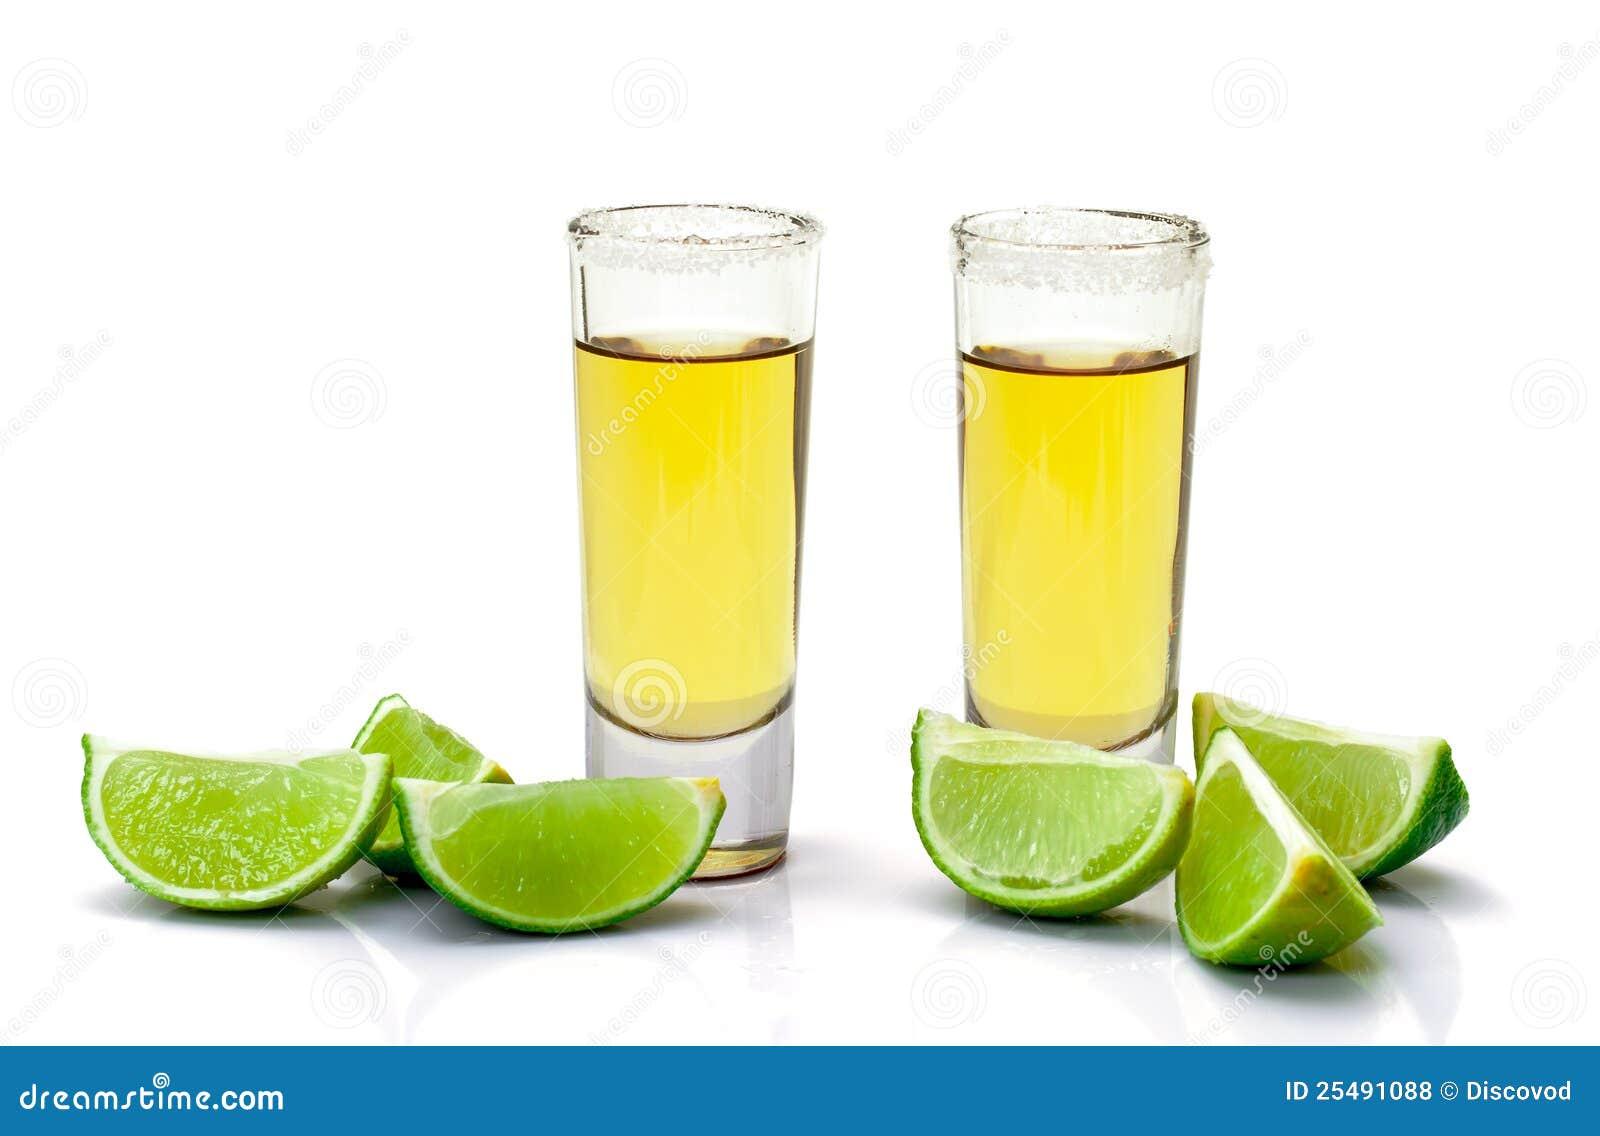 Caballito de tequila no mejor de semen - 2 part 9